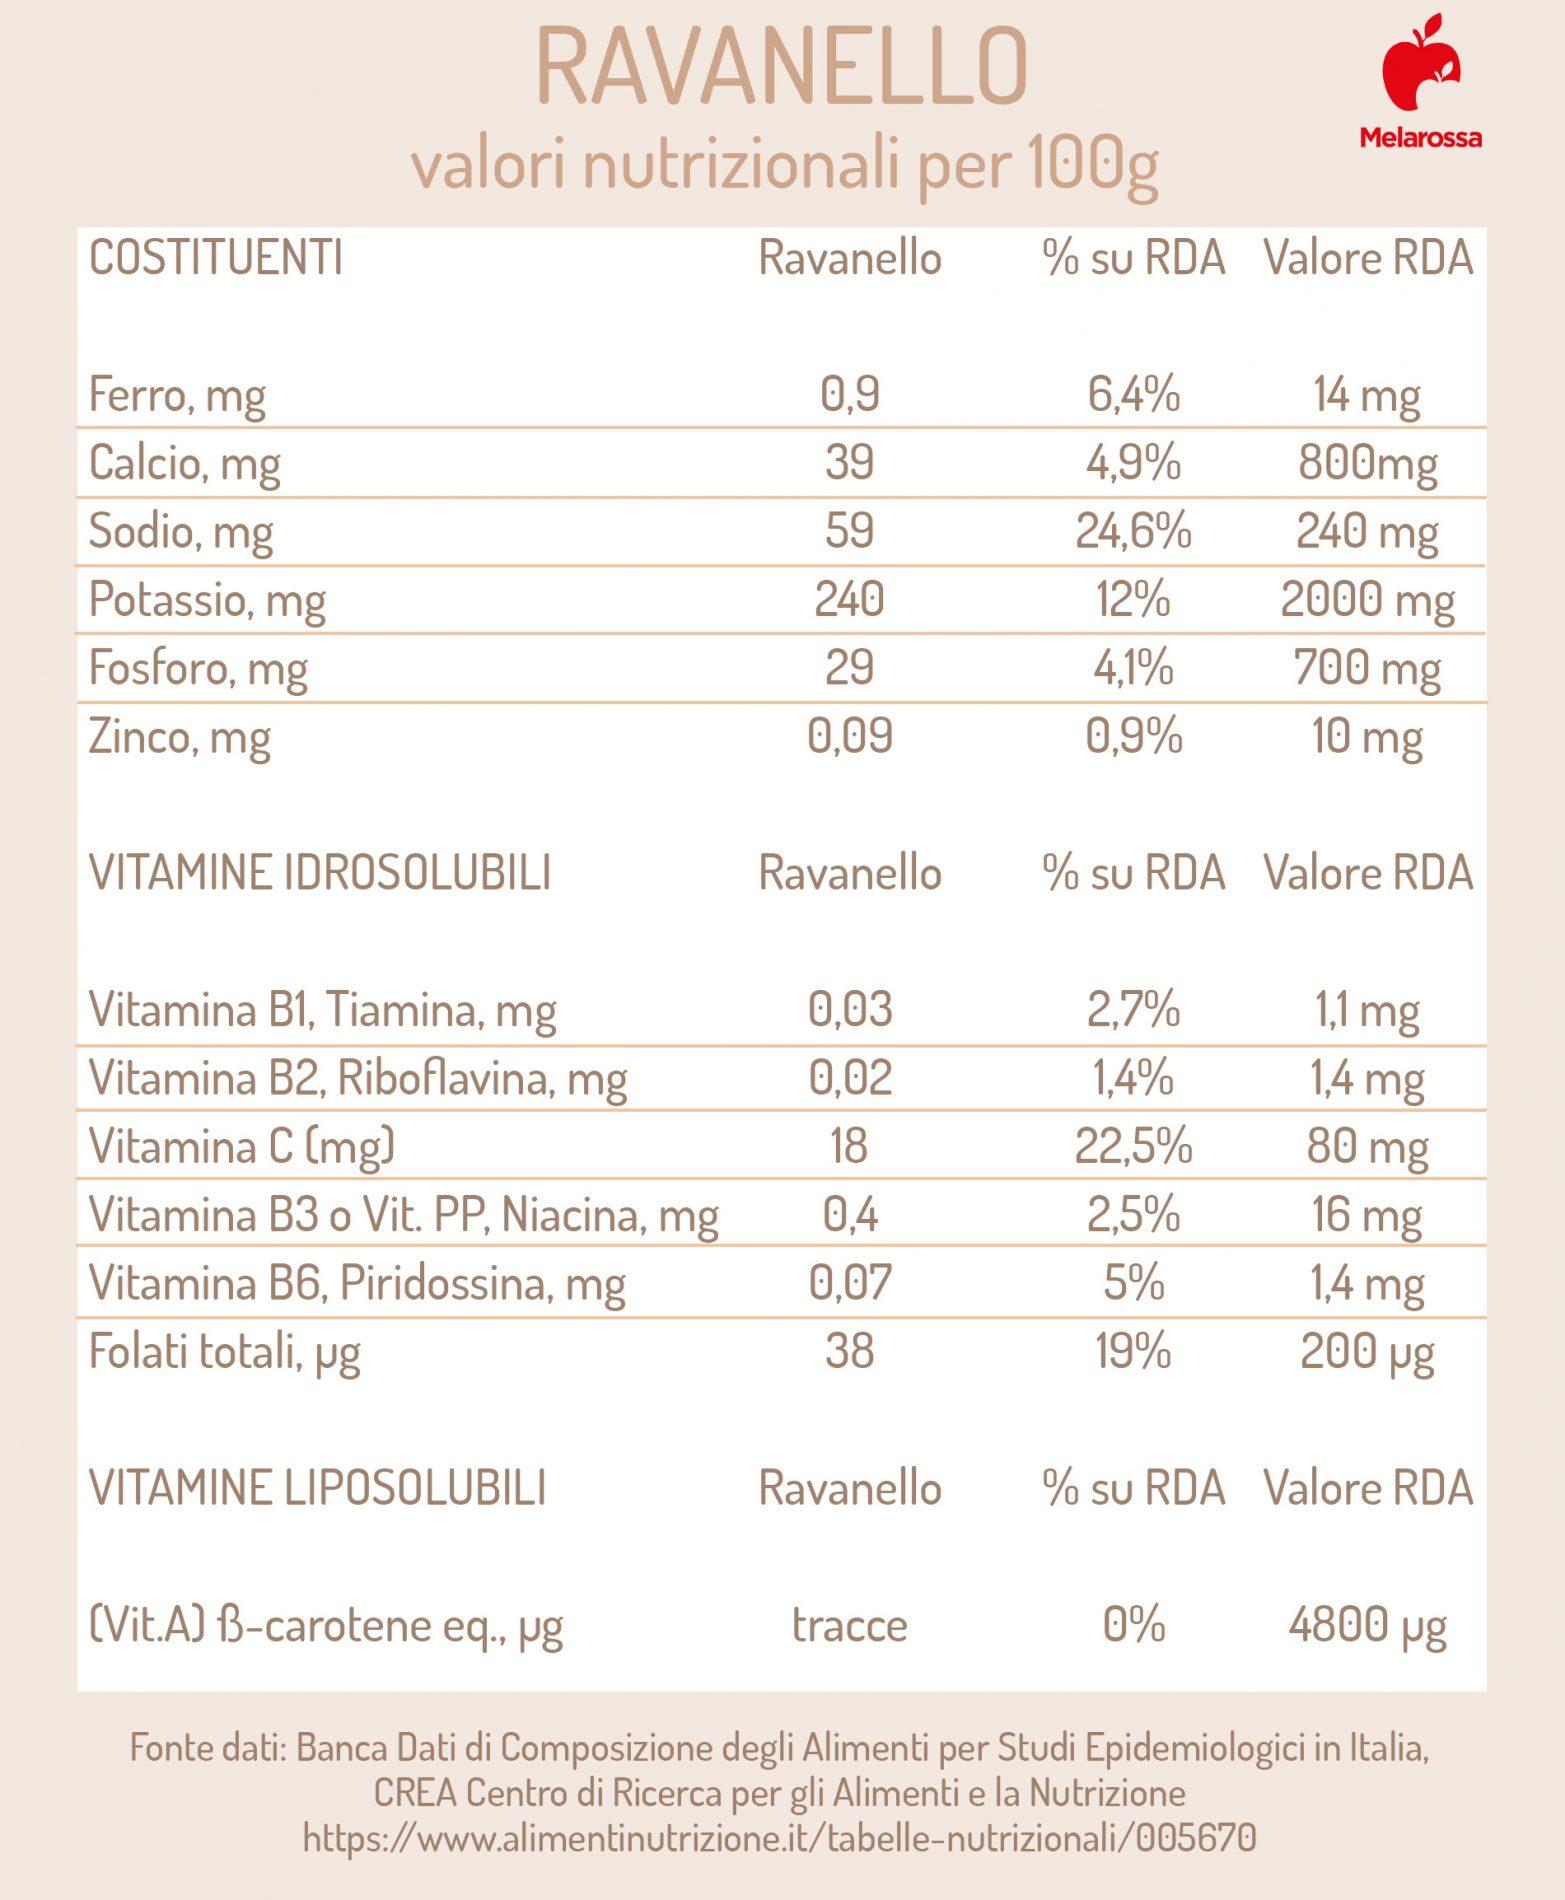 ravanelli: valori nutrizionali